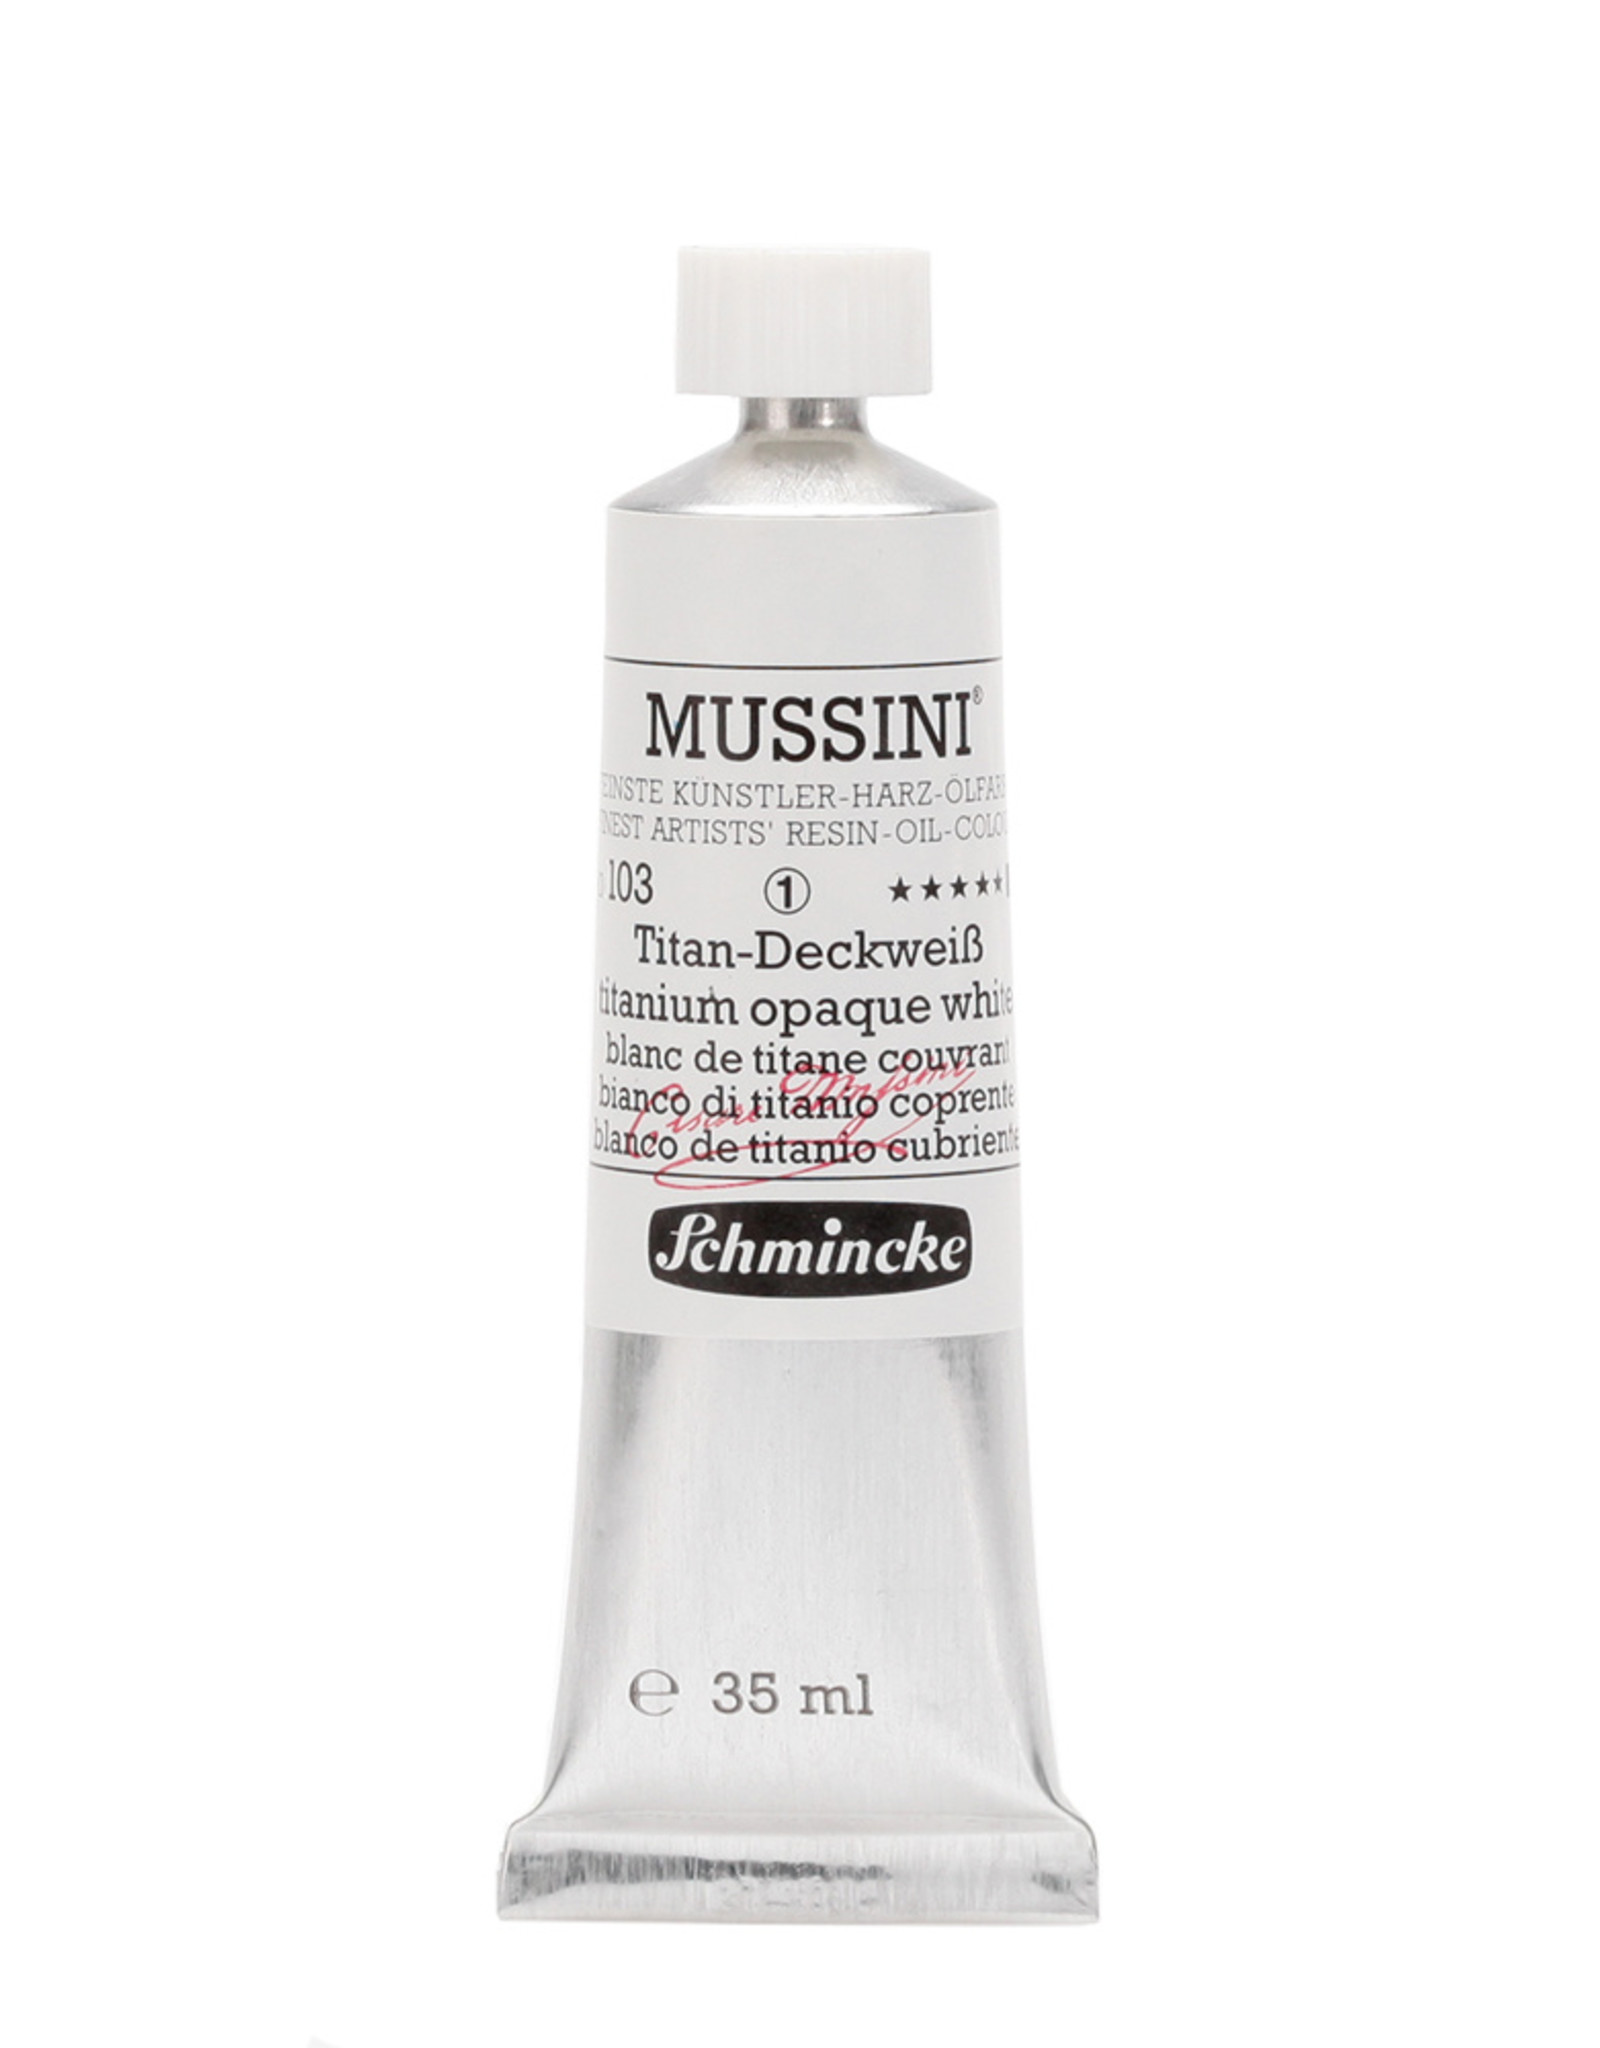 Schmincke Olieverf Mussini 35 ml Wit Titanium 103/1